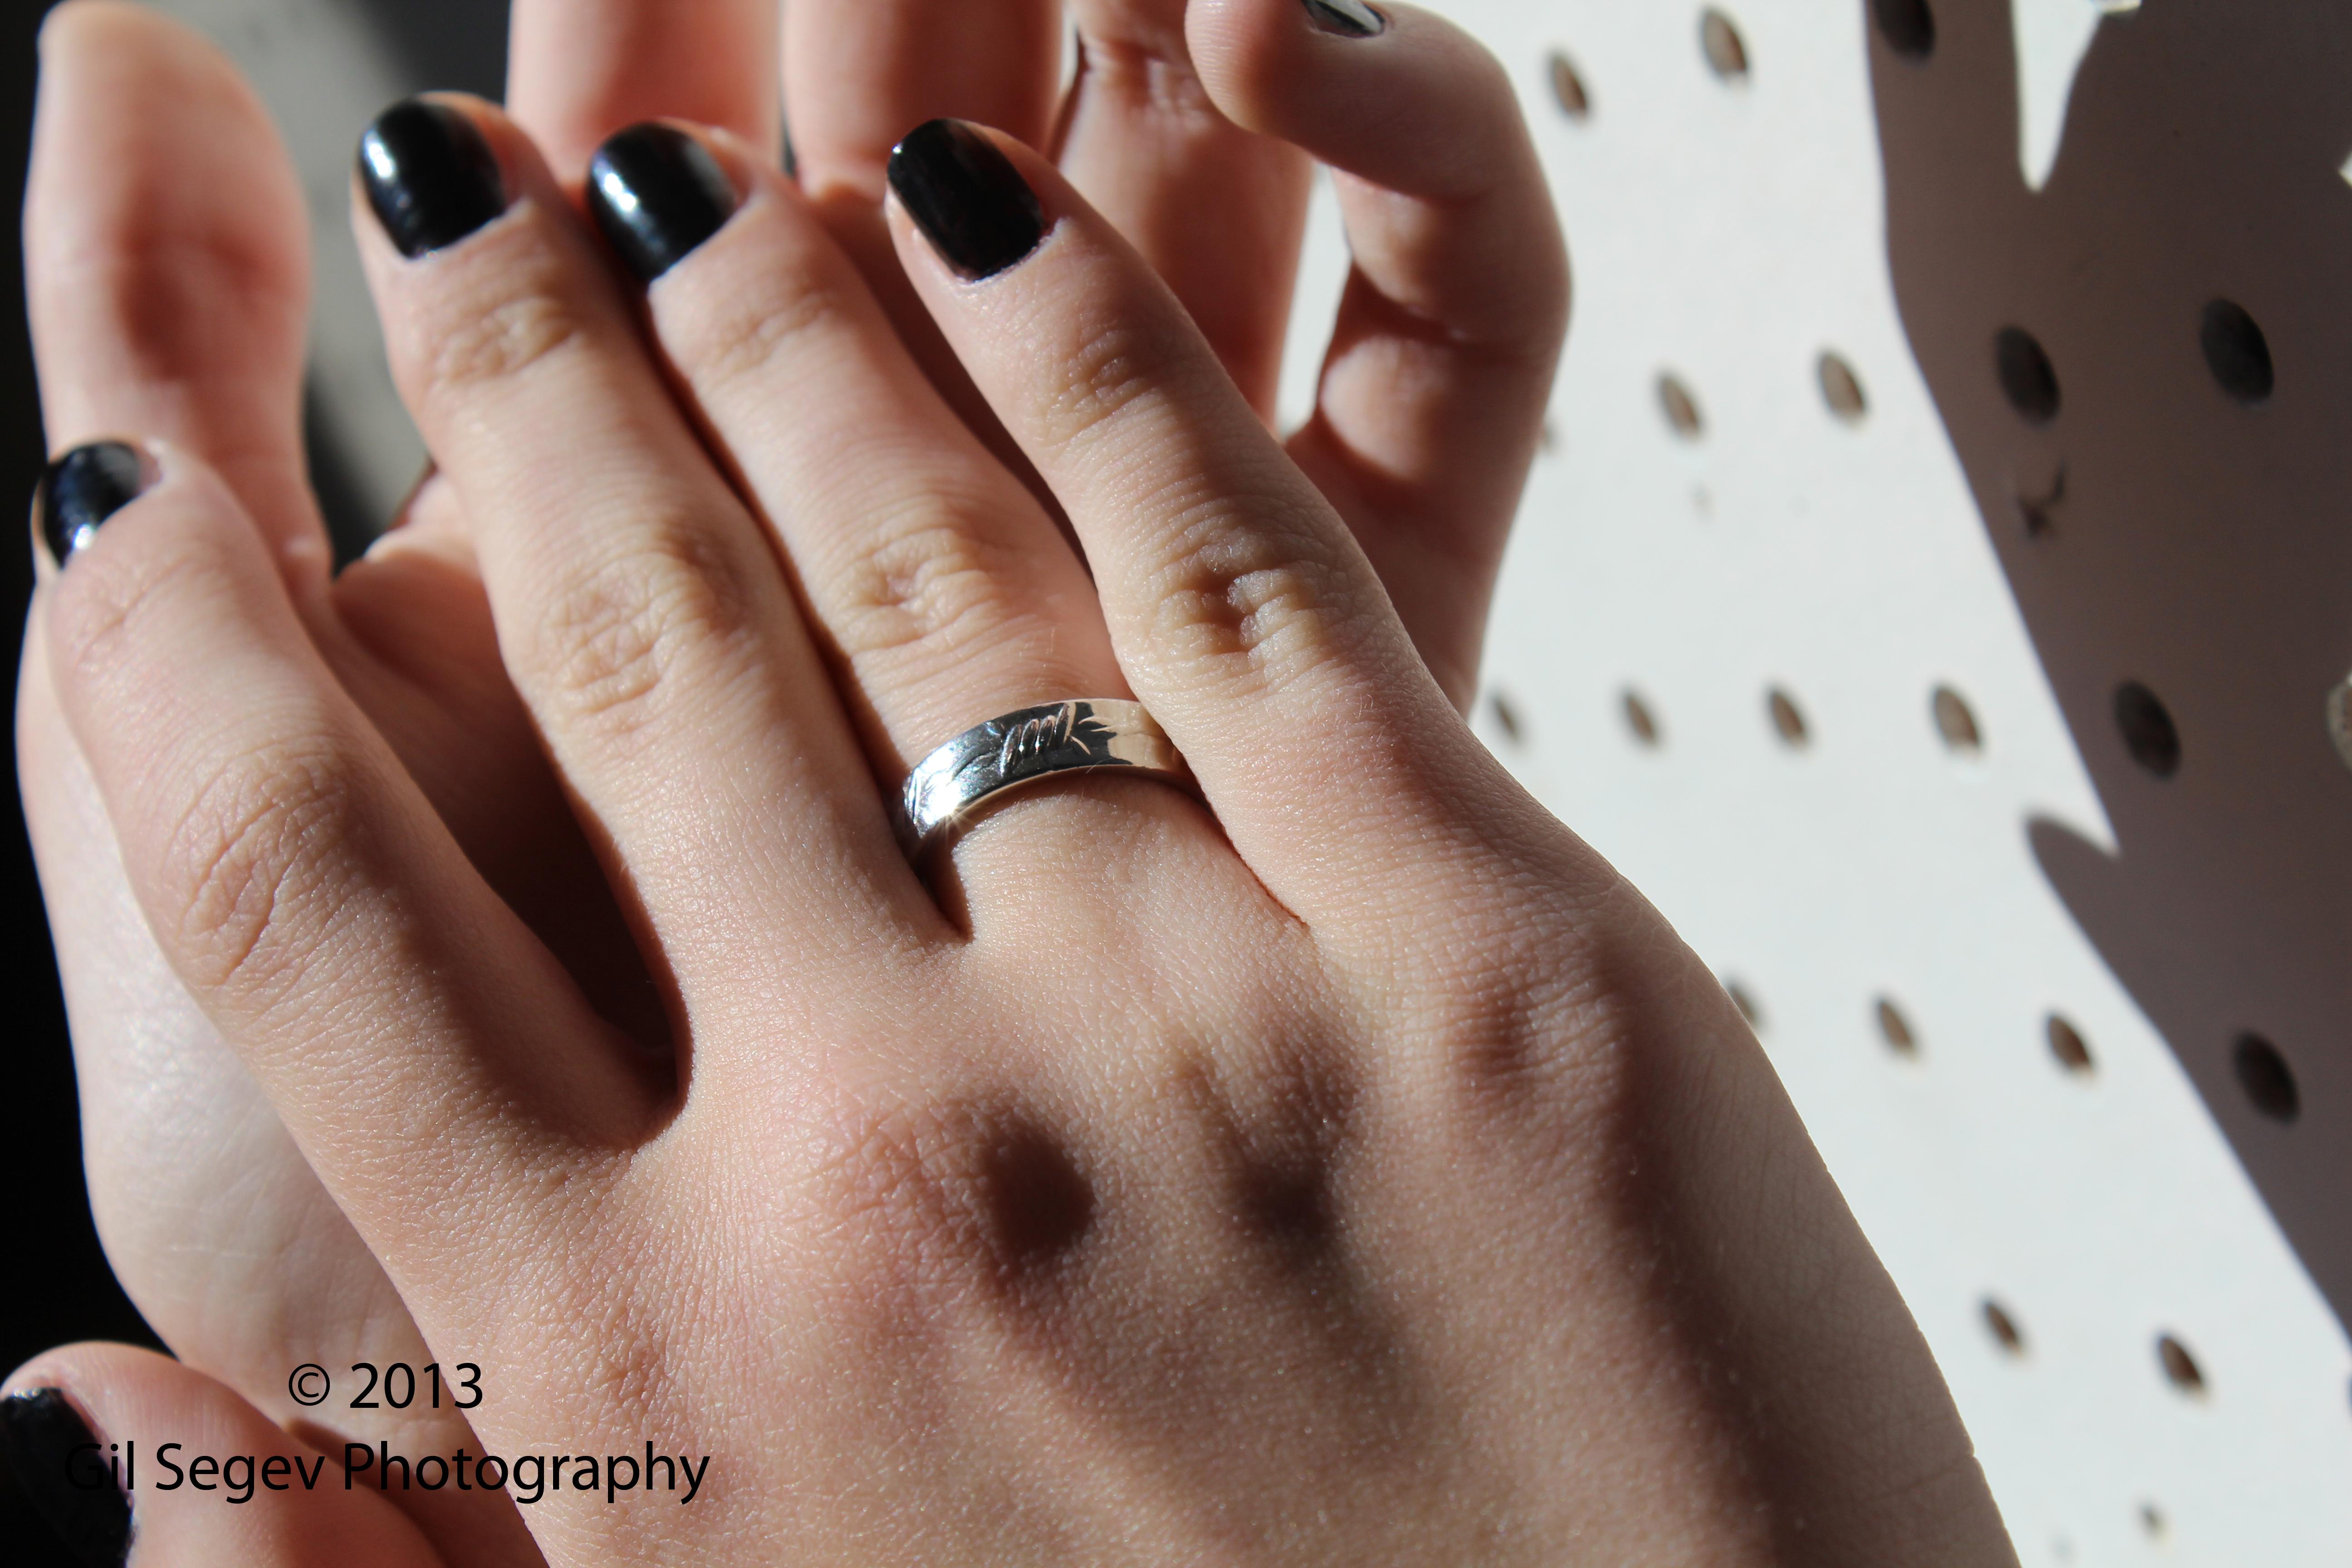 Avril Lavigne Forbidden Rose Ring